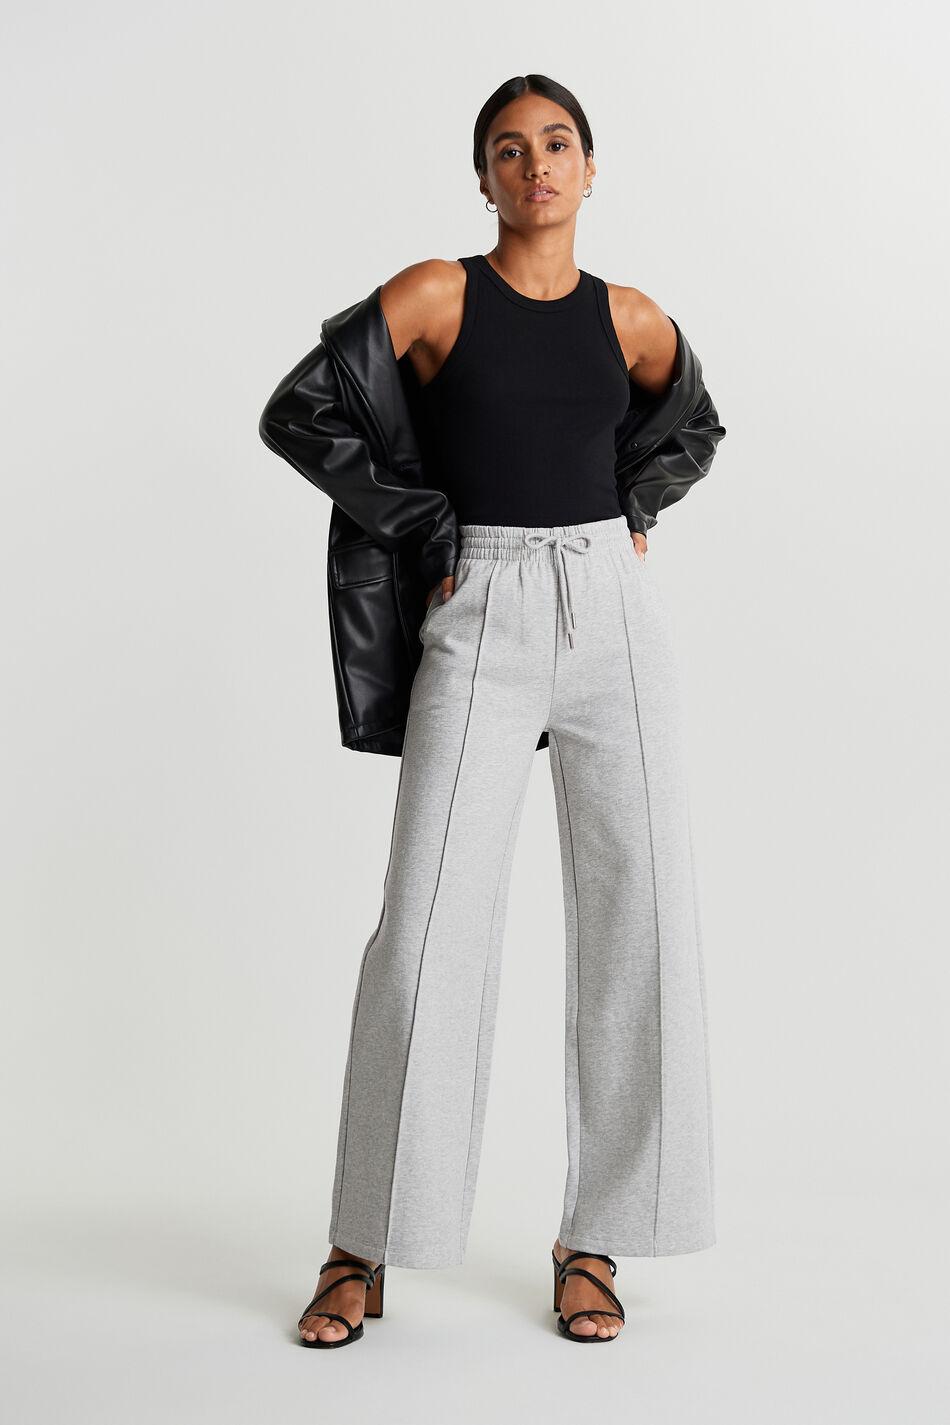 Gina Tricot Bonnie sweatpants M Female Grey melange (8181)